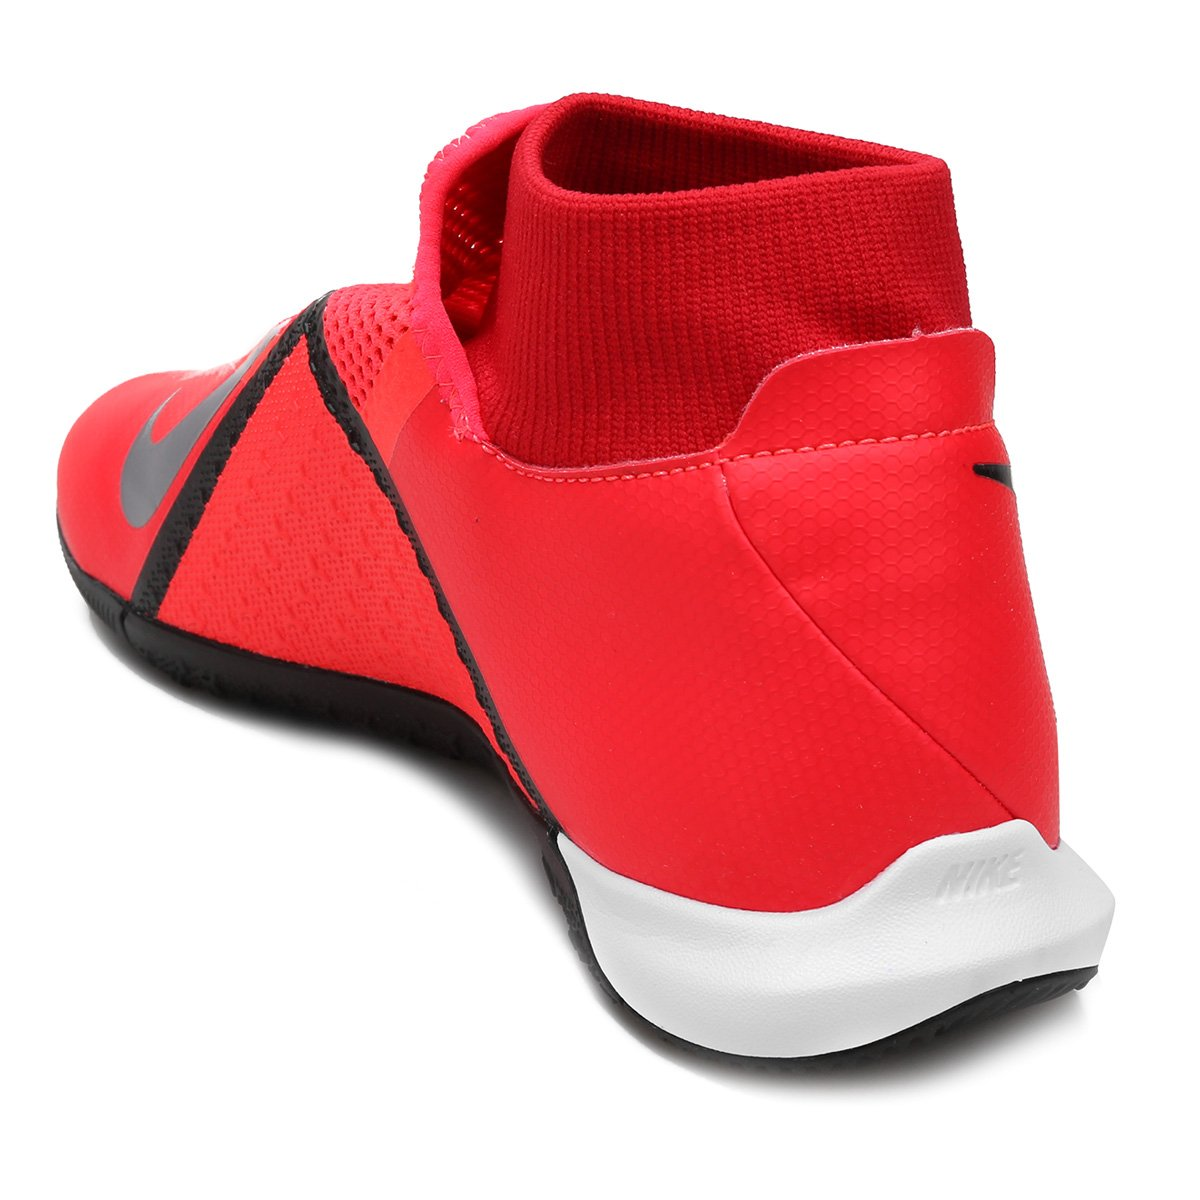 55bfbc5027 Chuteira Futsal Nike Phantom Vision Academy DF IC